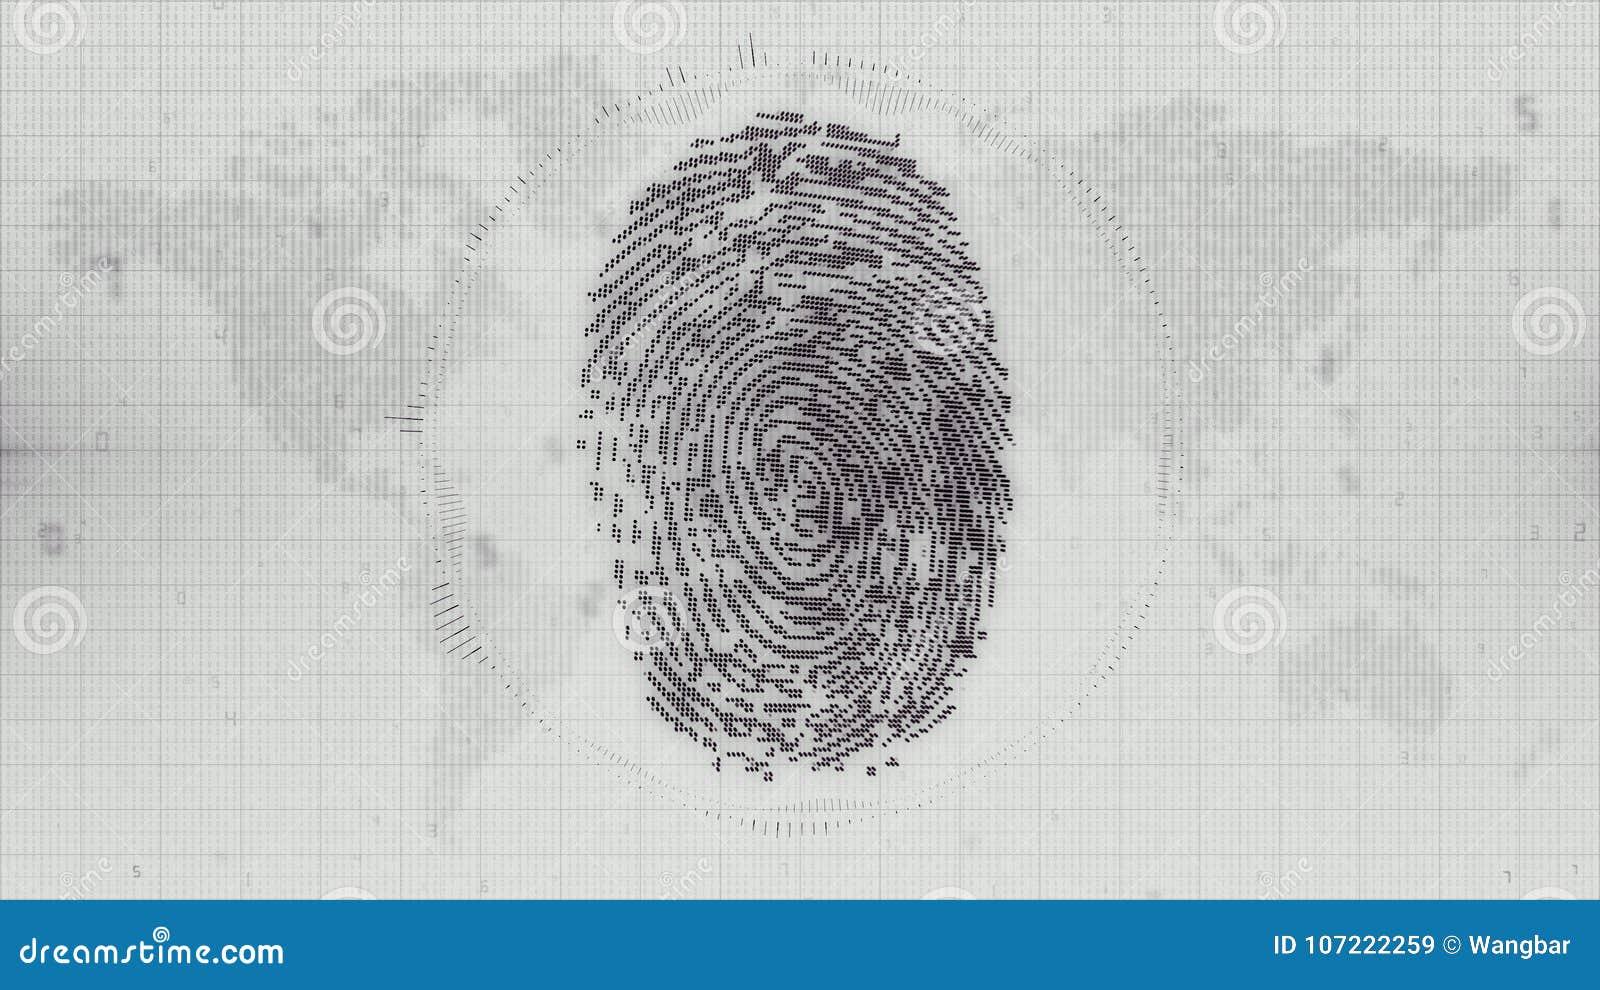 Monochrome fingerprint electronic ID on Earth map background